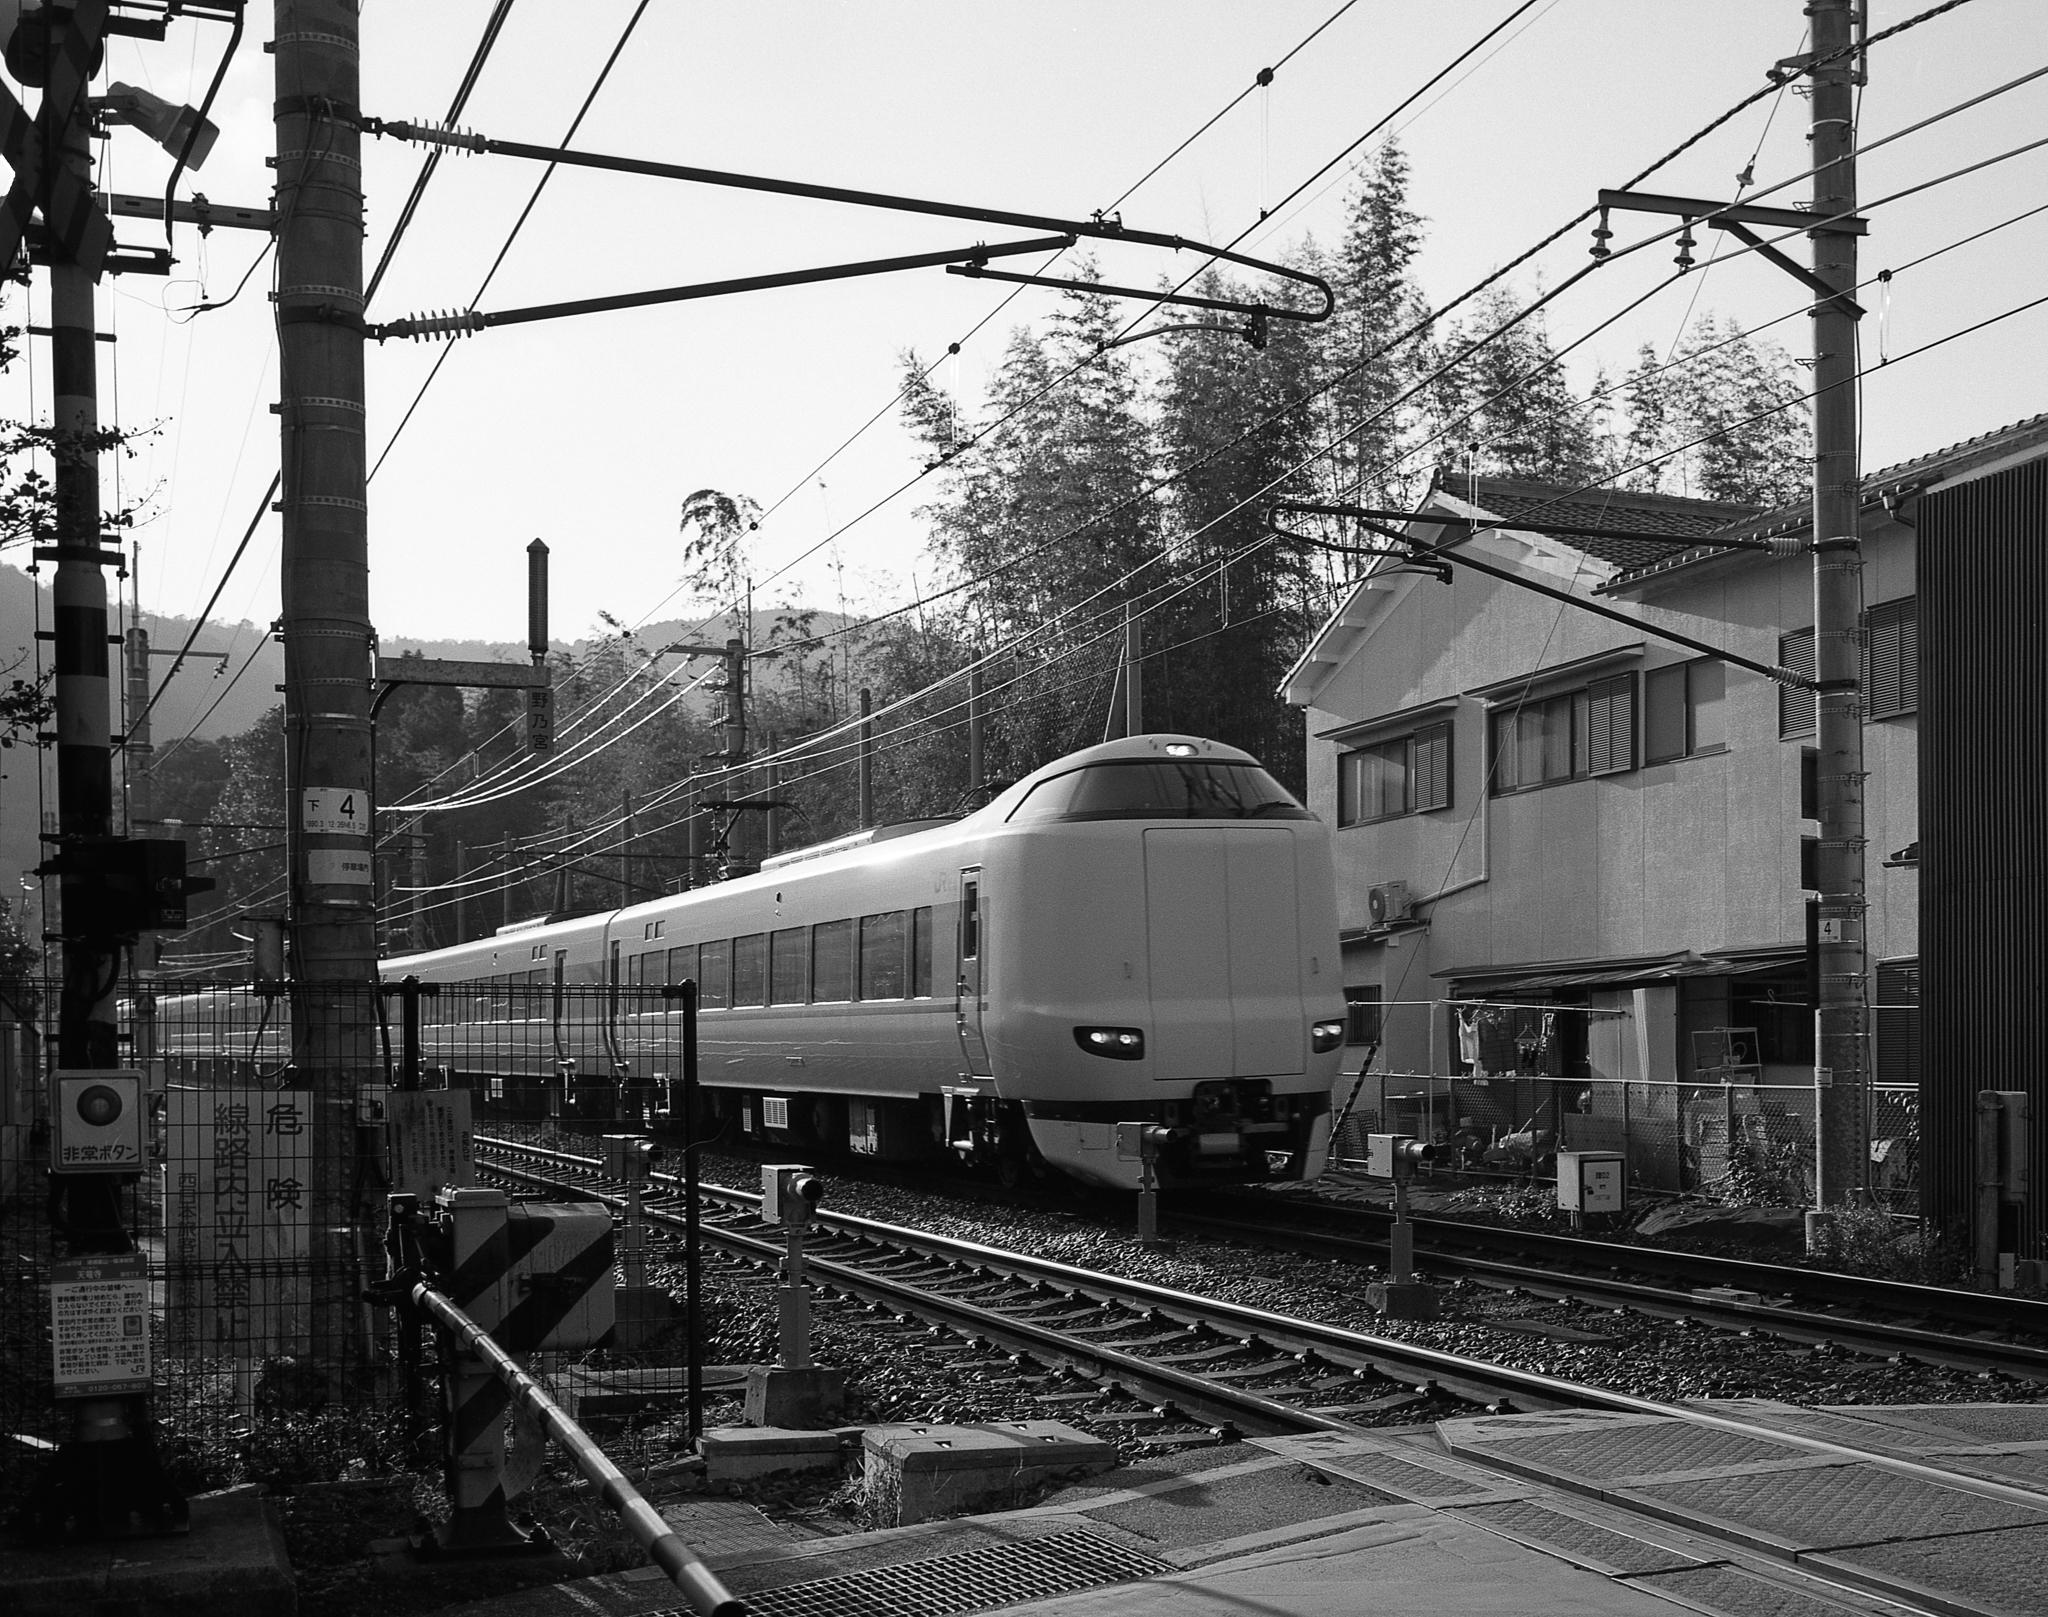 Train in Ikebukuro (Mamiya 7II Ilford HP5+)